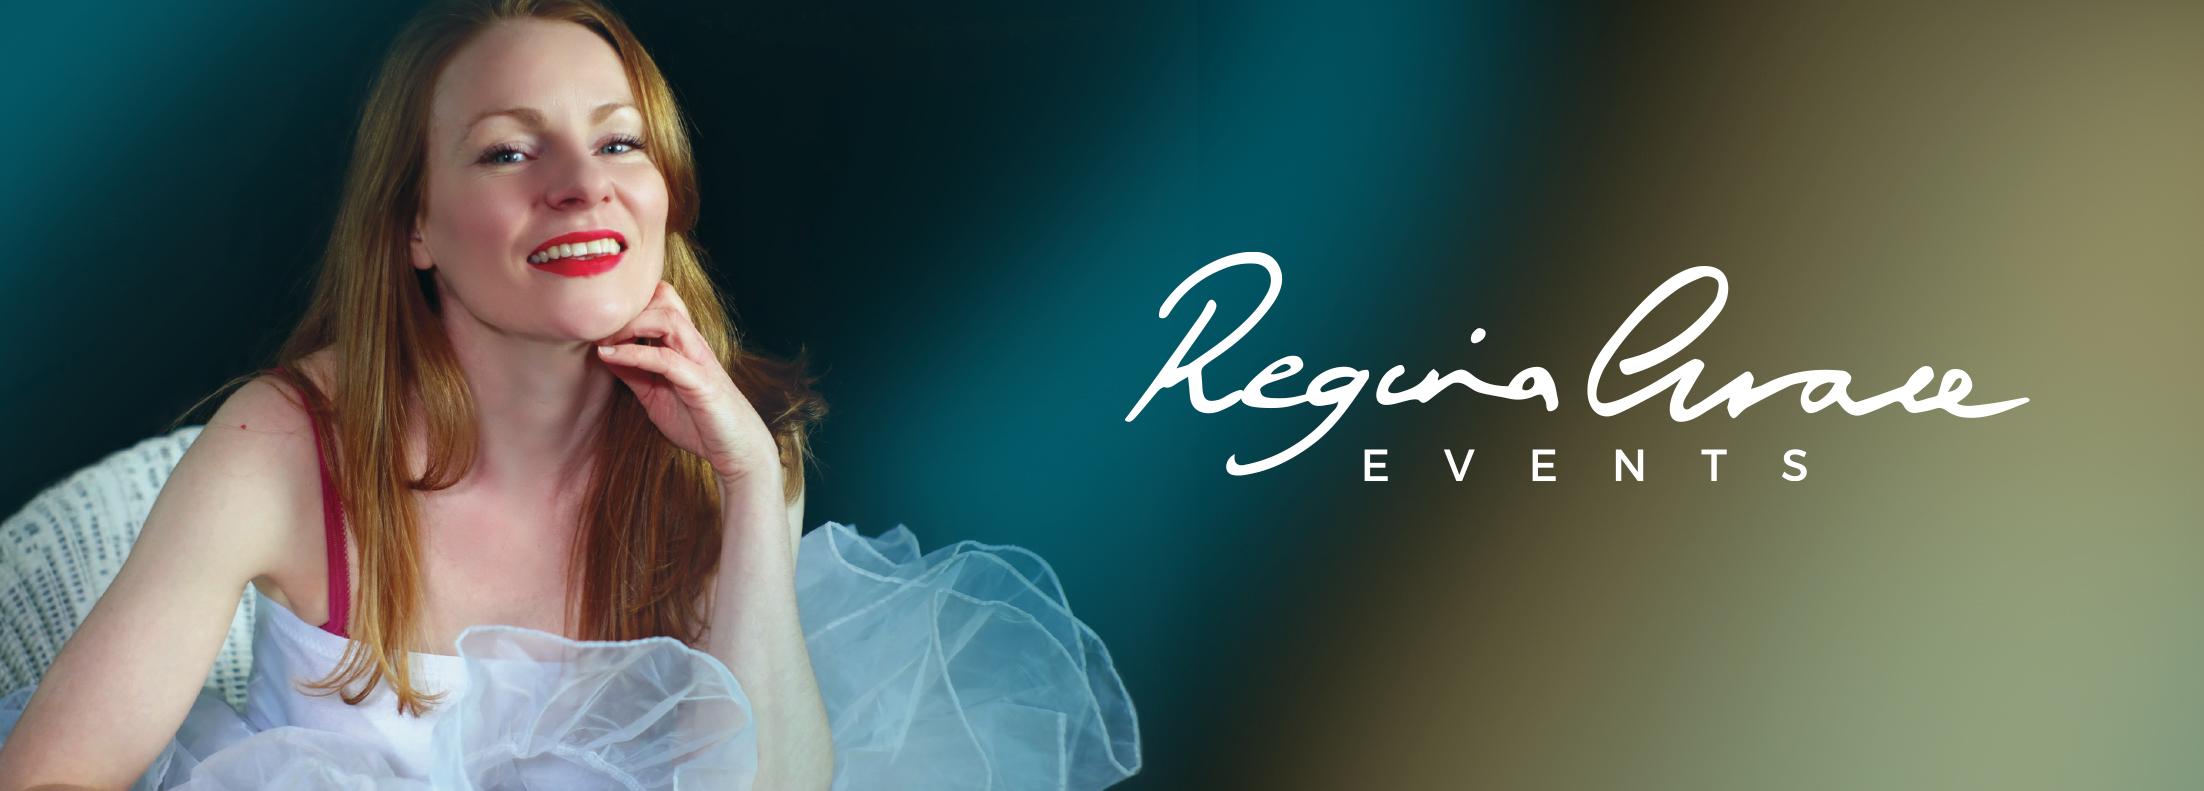 Regina Vereker Film Event Planner